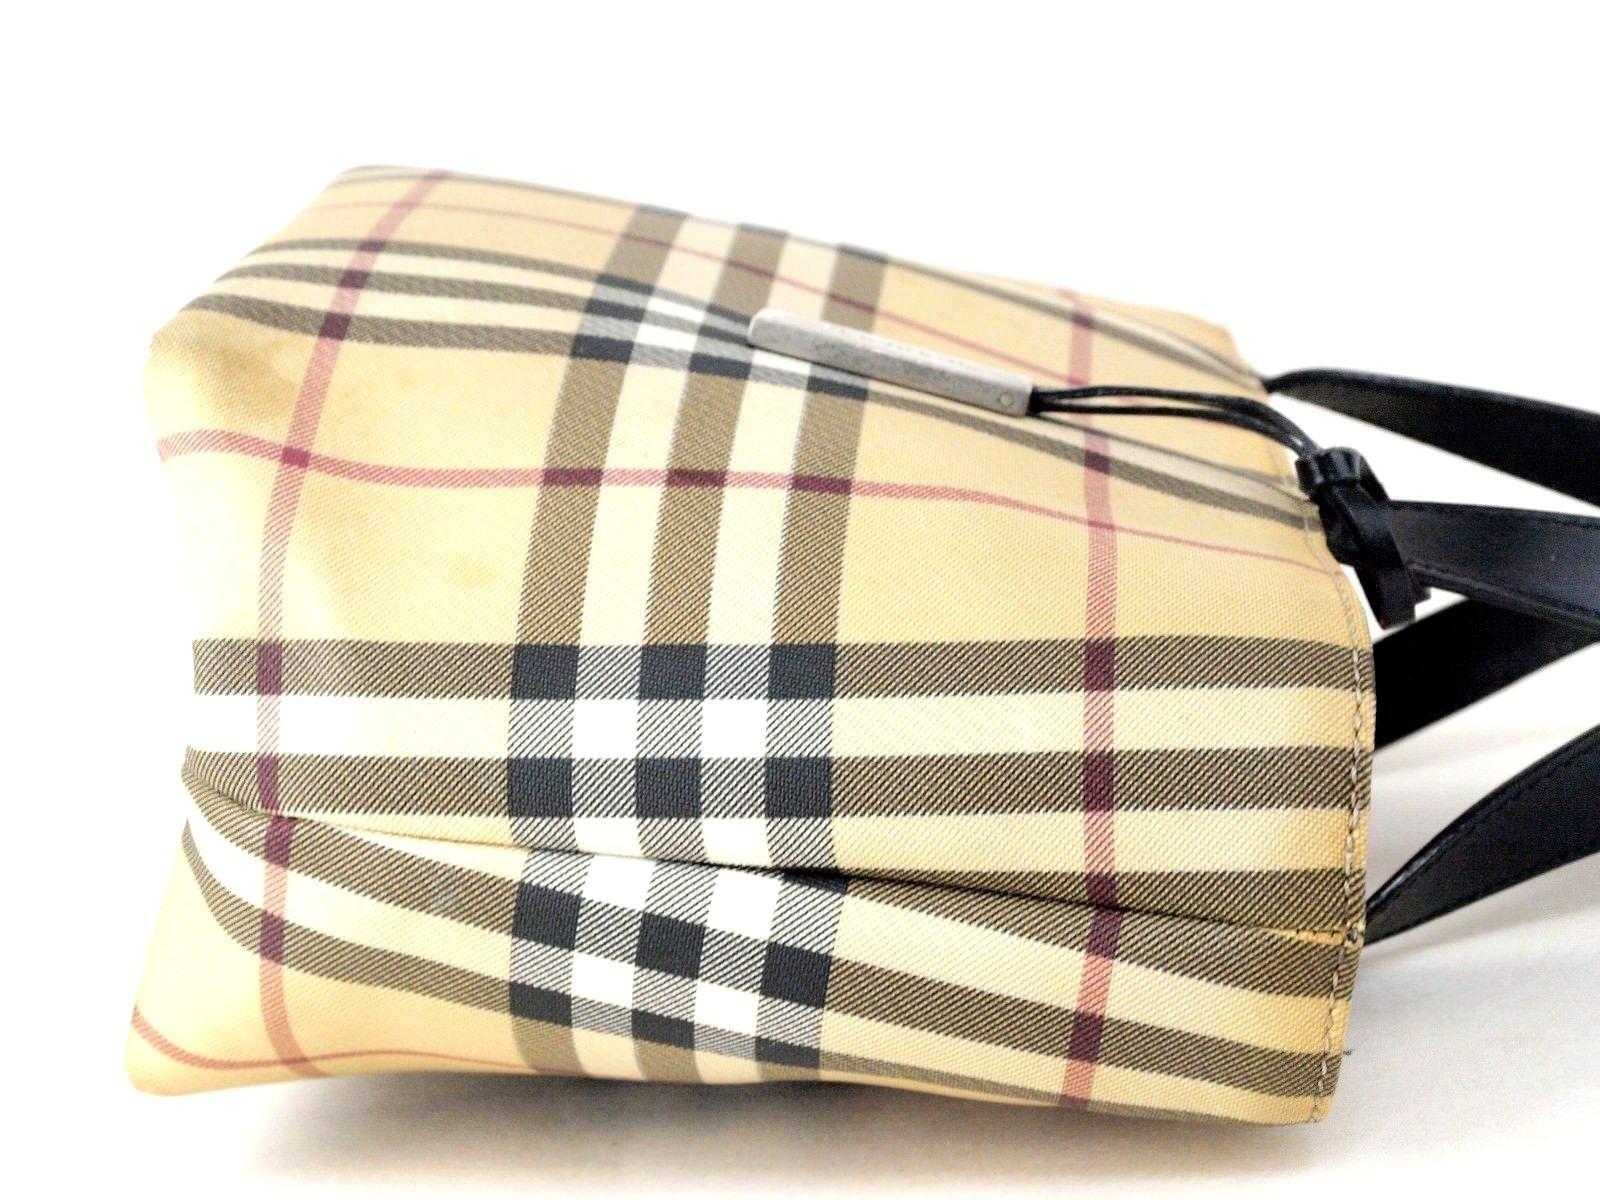 c90ccfc9bca2 Authentic Burberry London Nova Check PVC Canvas   Leather Hand Bag Italy  Vintage